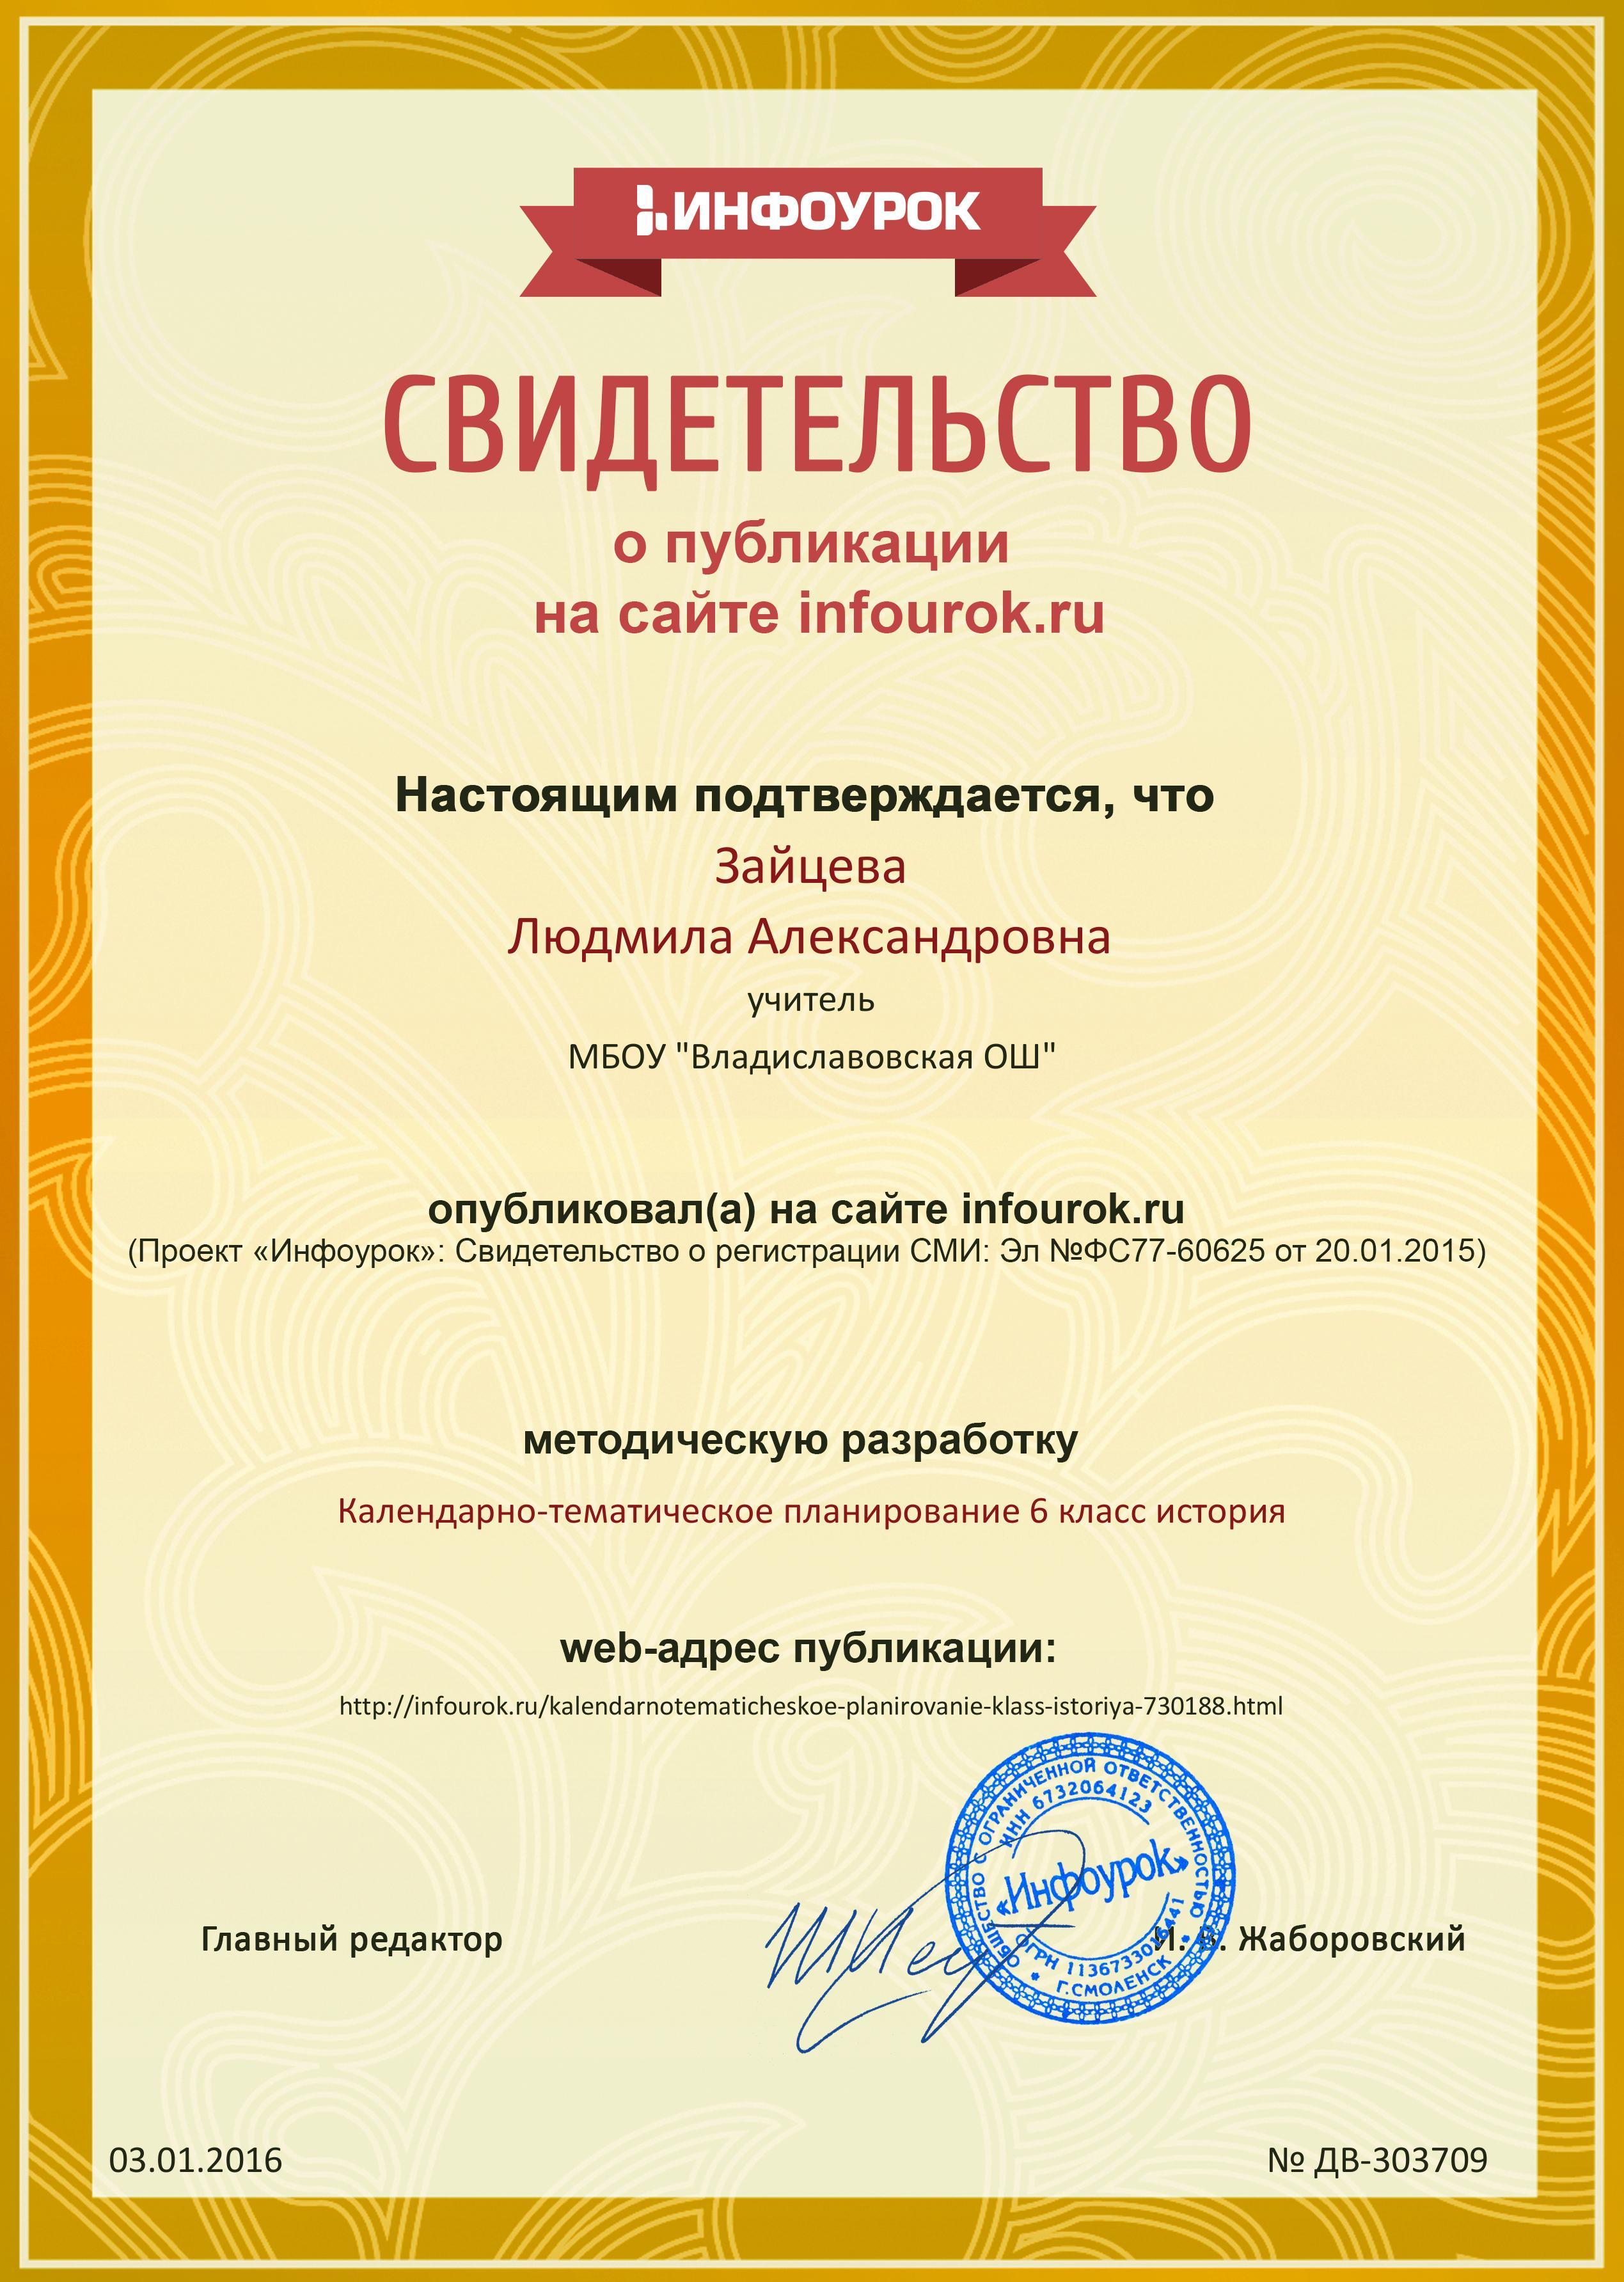 D:\школа\аттестация\Сертификат проекта infourok.ru № ДВ-303709.jpg